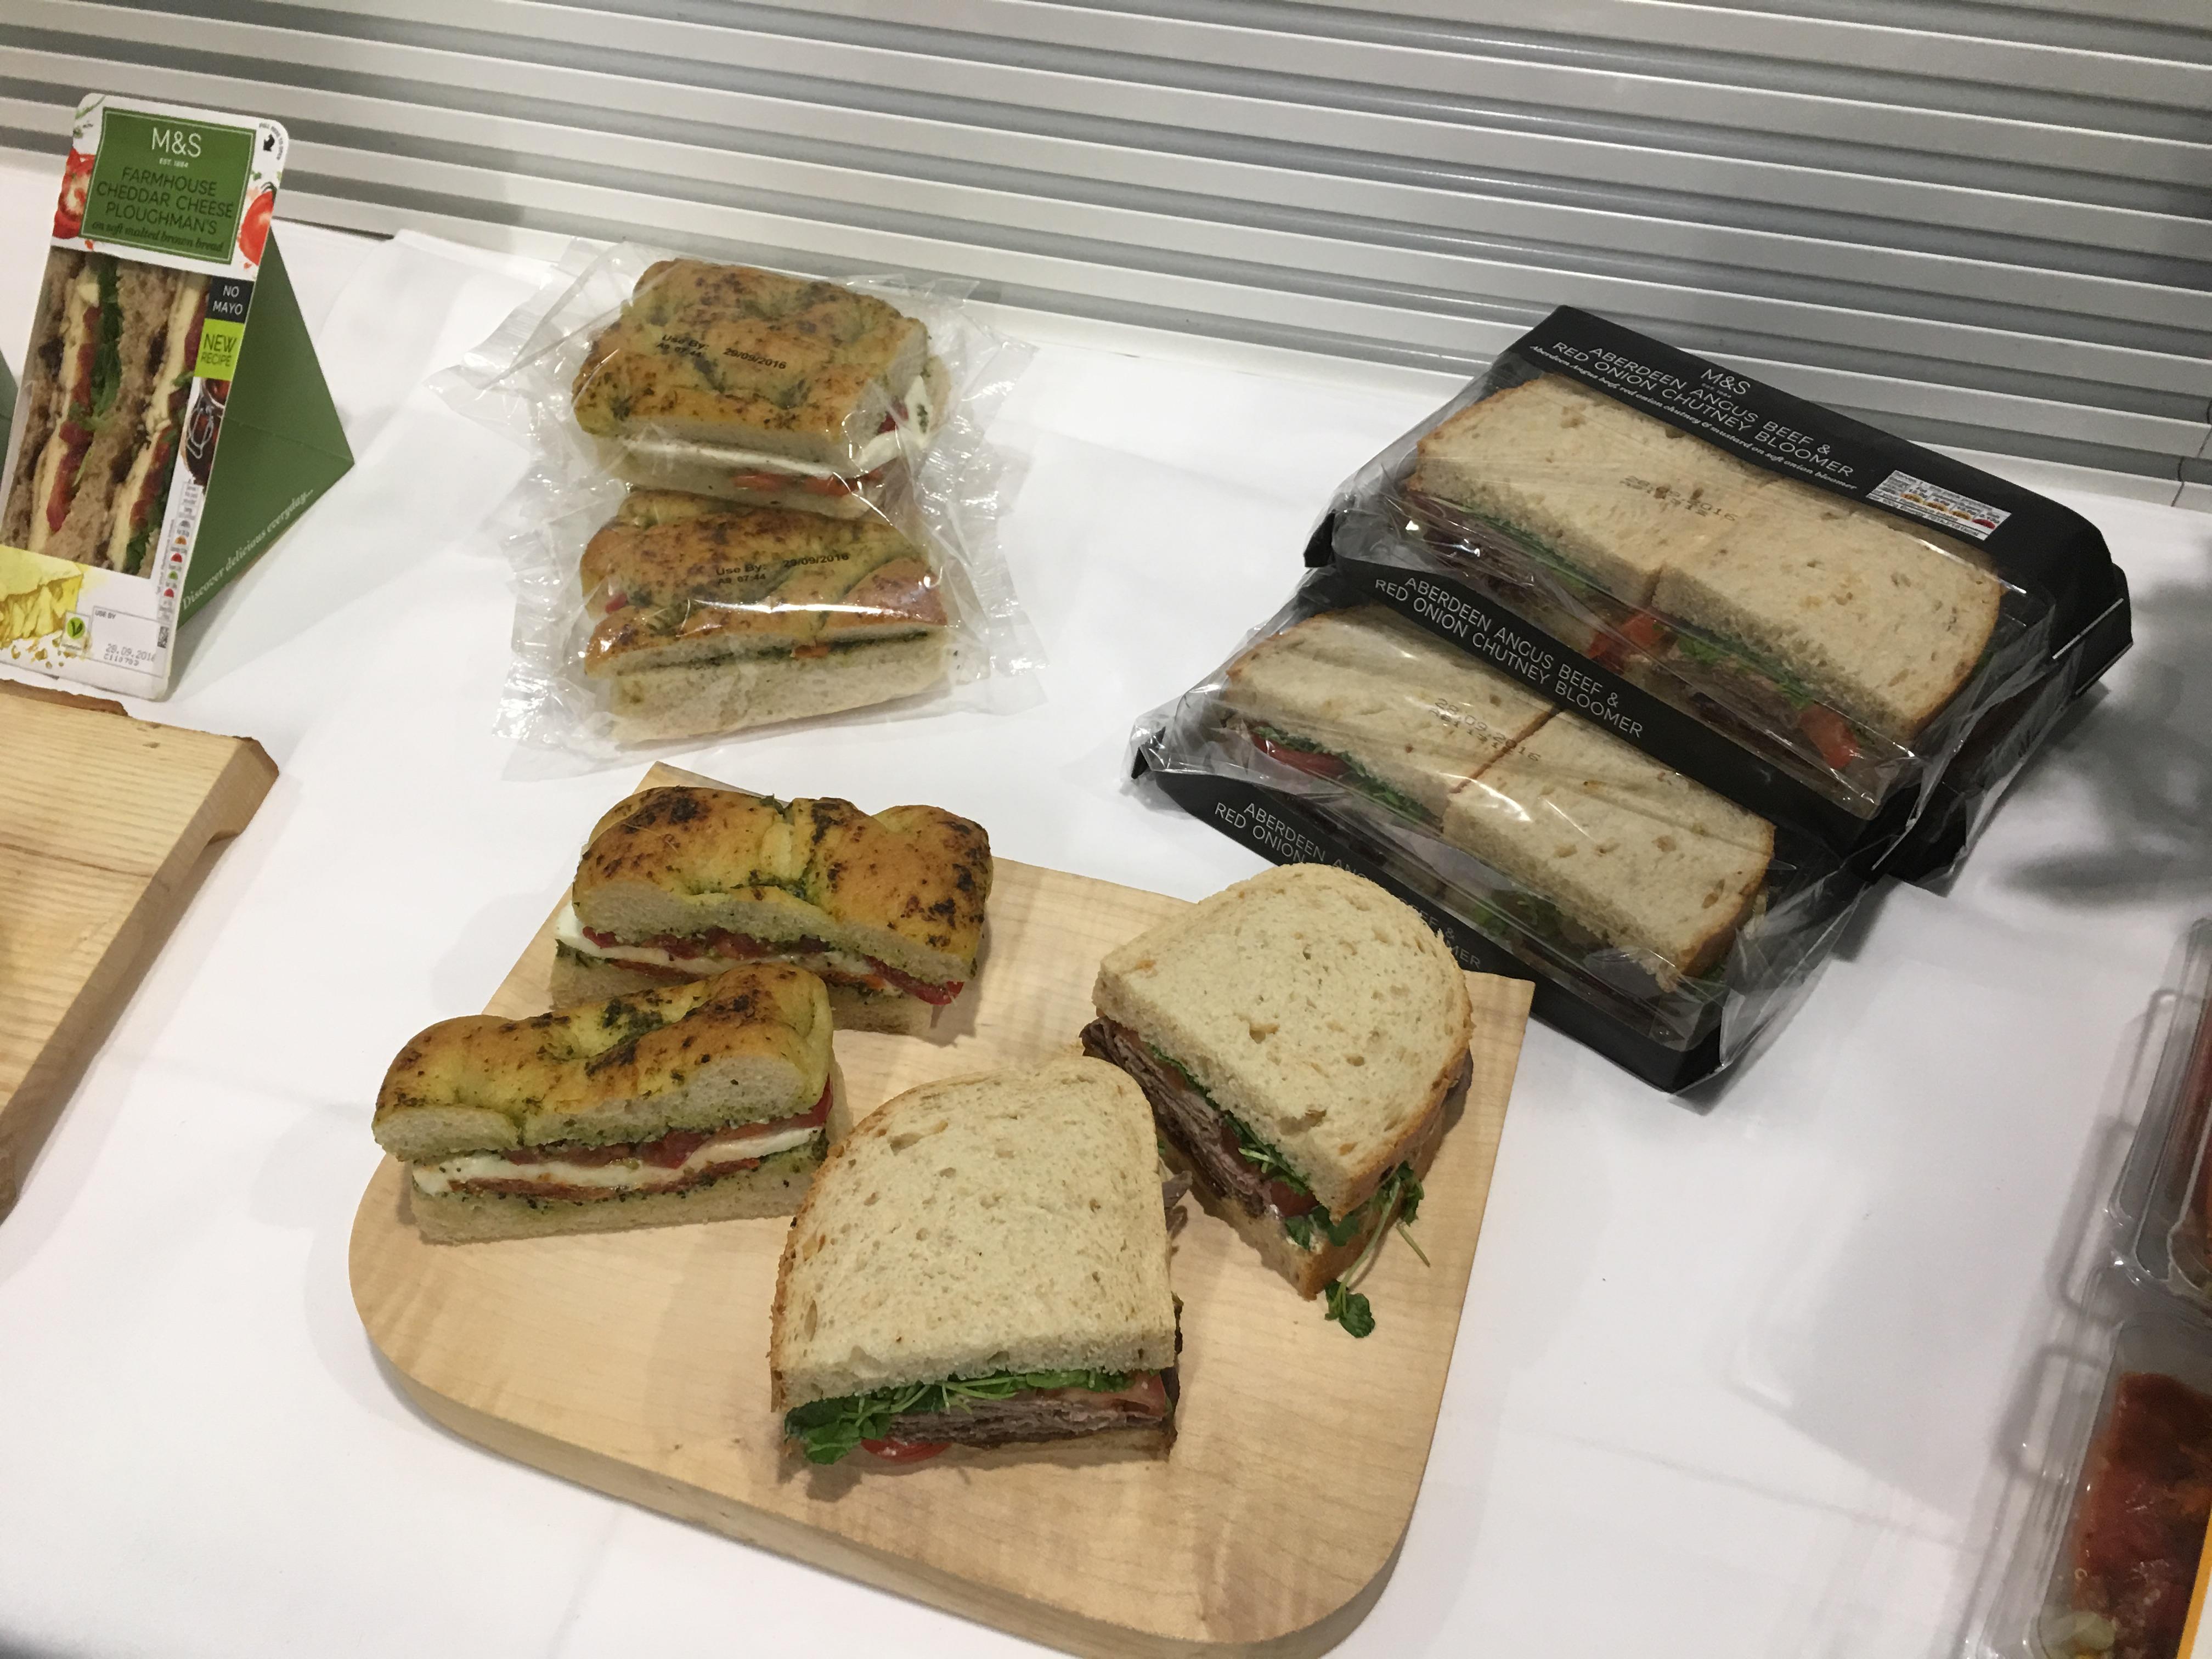 food ba drink stop haul economy even short water insideflyer sandwiches offering